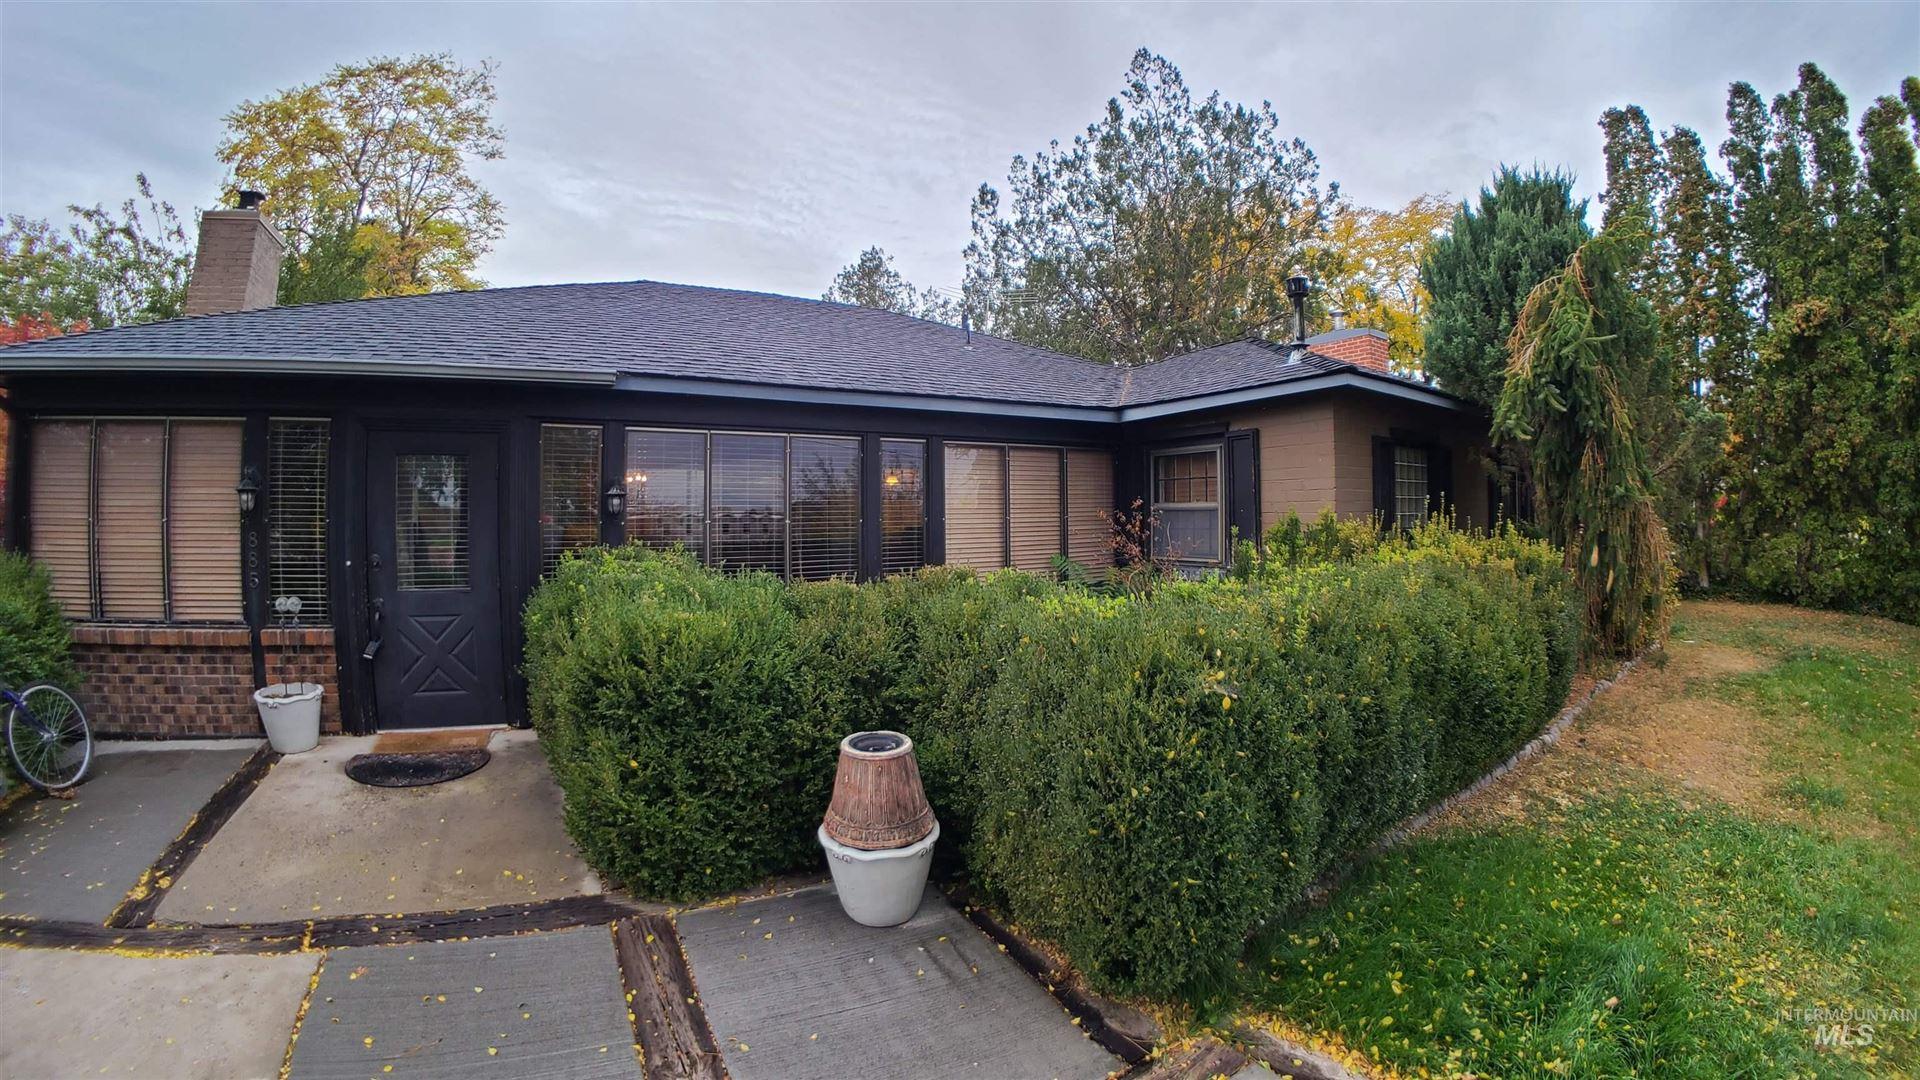 Photo of 885 S Park Blvd, Ontario, OR 97914-0000 (MLS # 98823234)